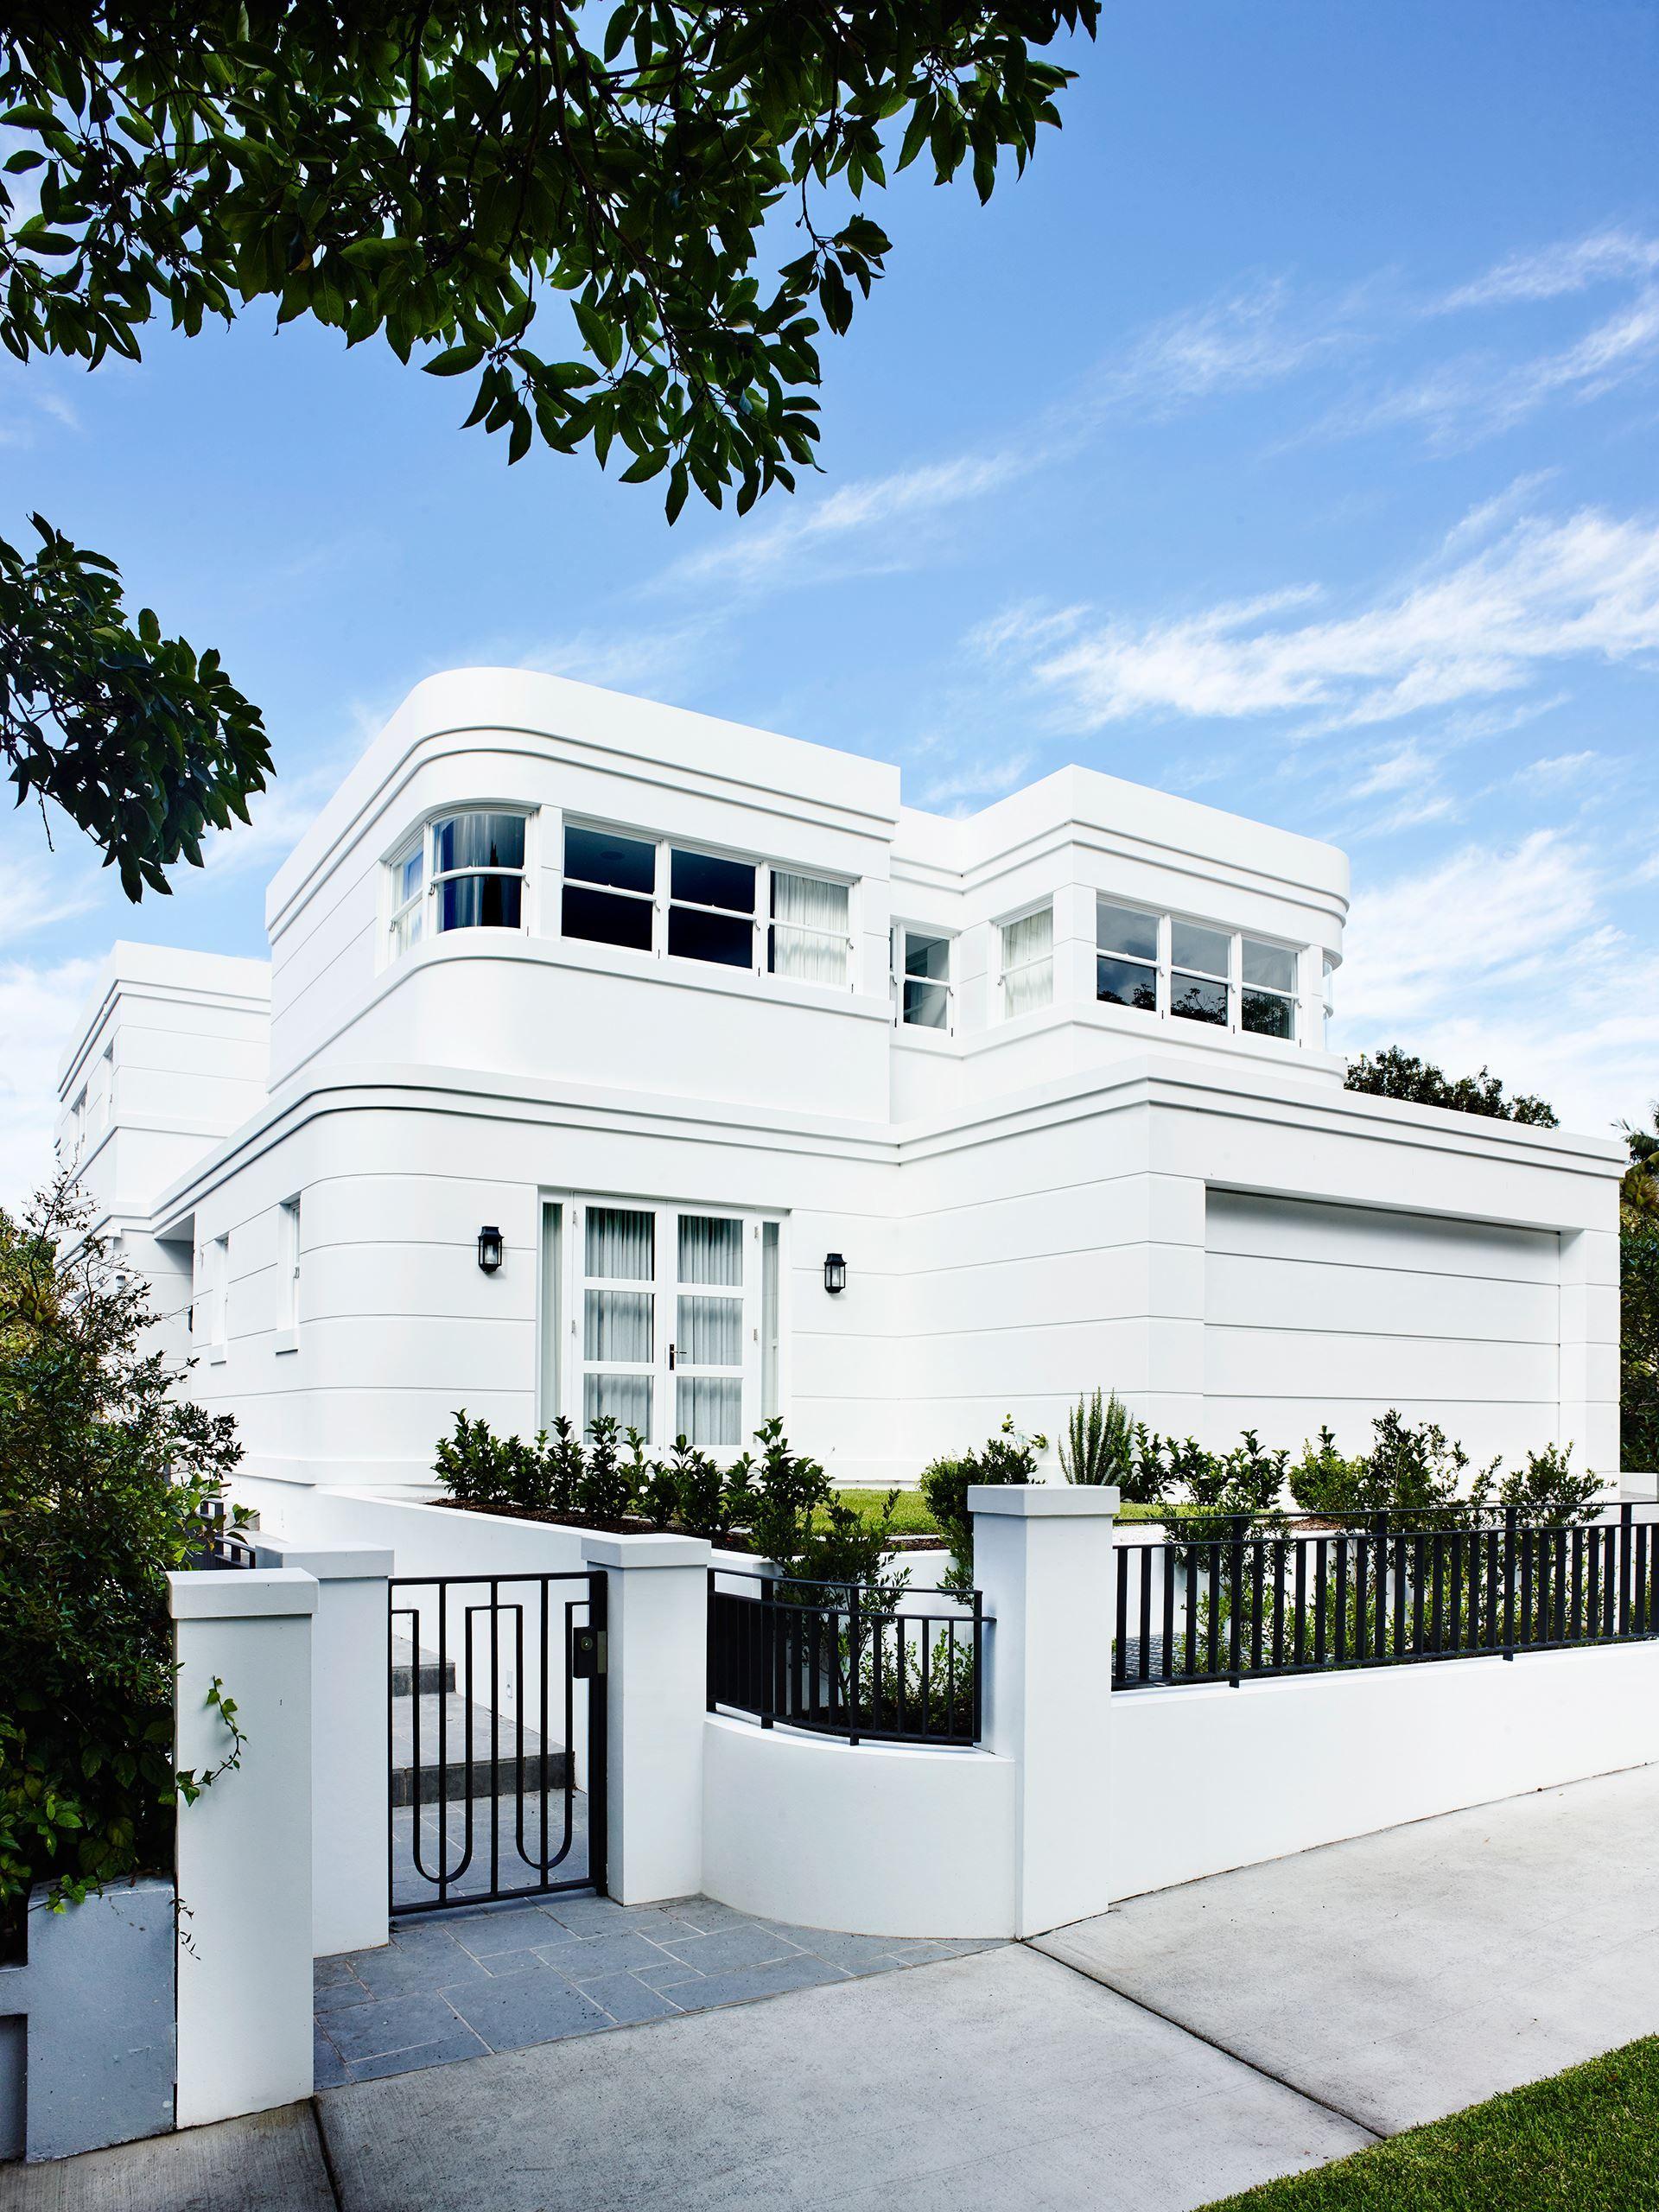 Sydney Art Deco Home By Interior Designer Greg Natale | Natale, Art ...